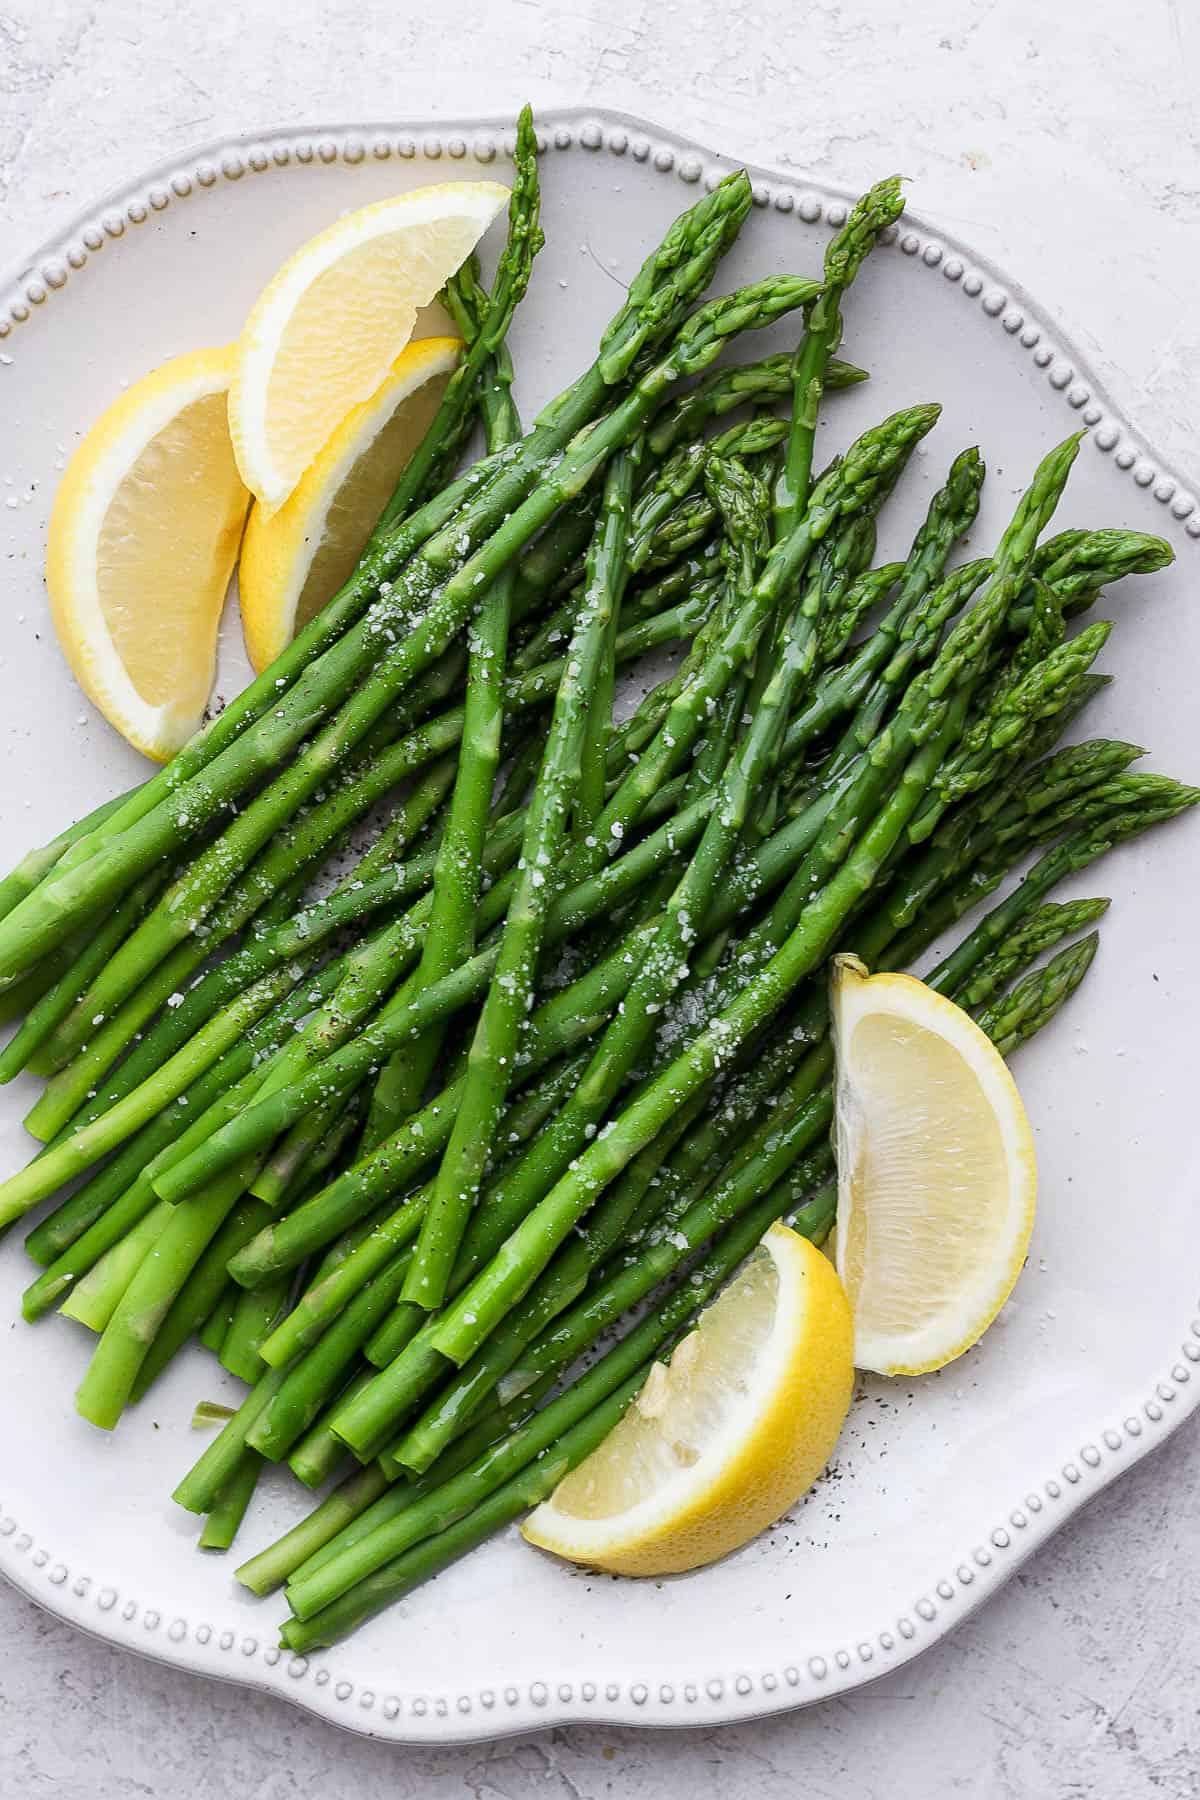 Boiled asparagus on a plate with lemon wedges